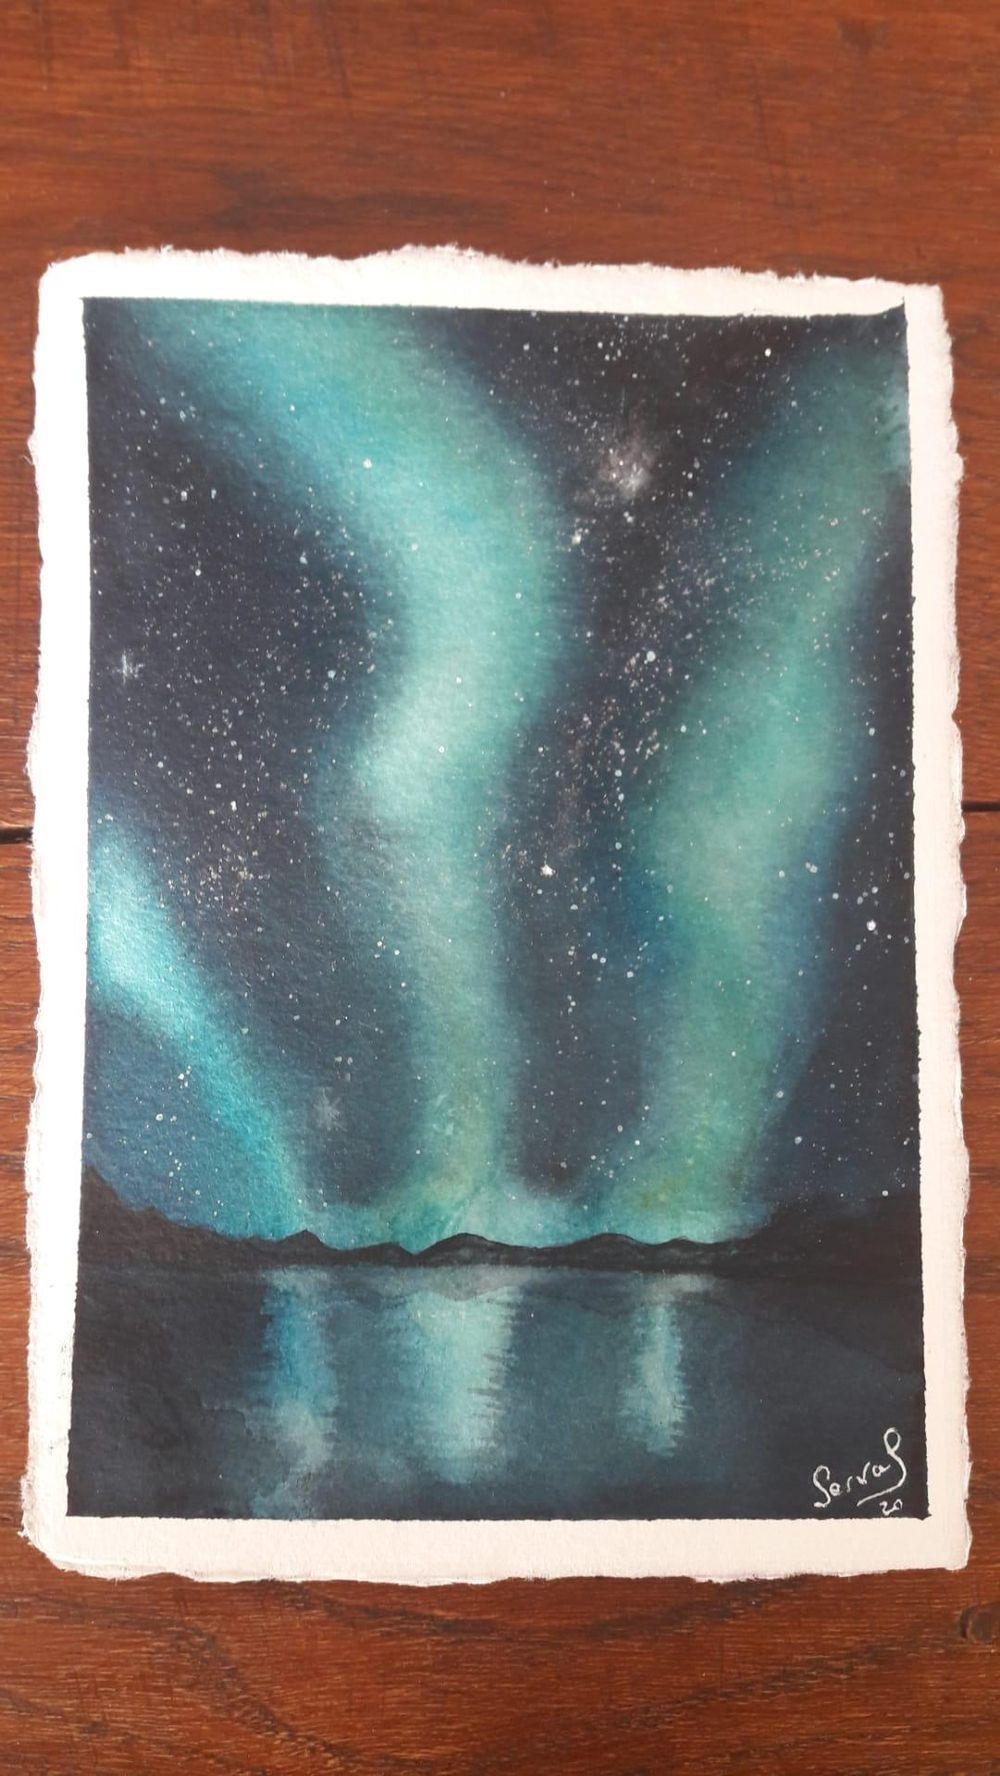 Aurora Borealis - image 1 - student project